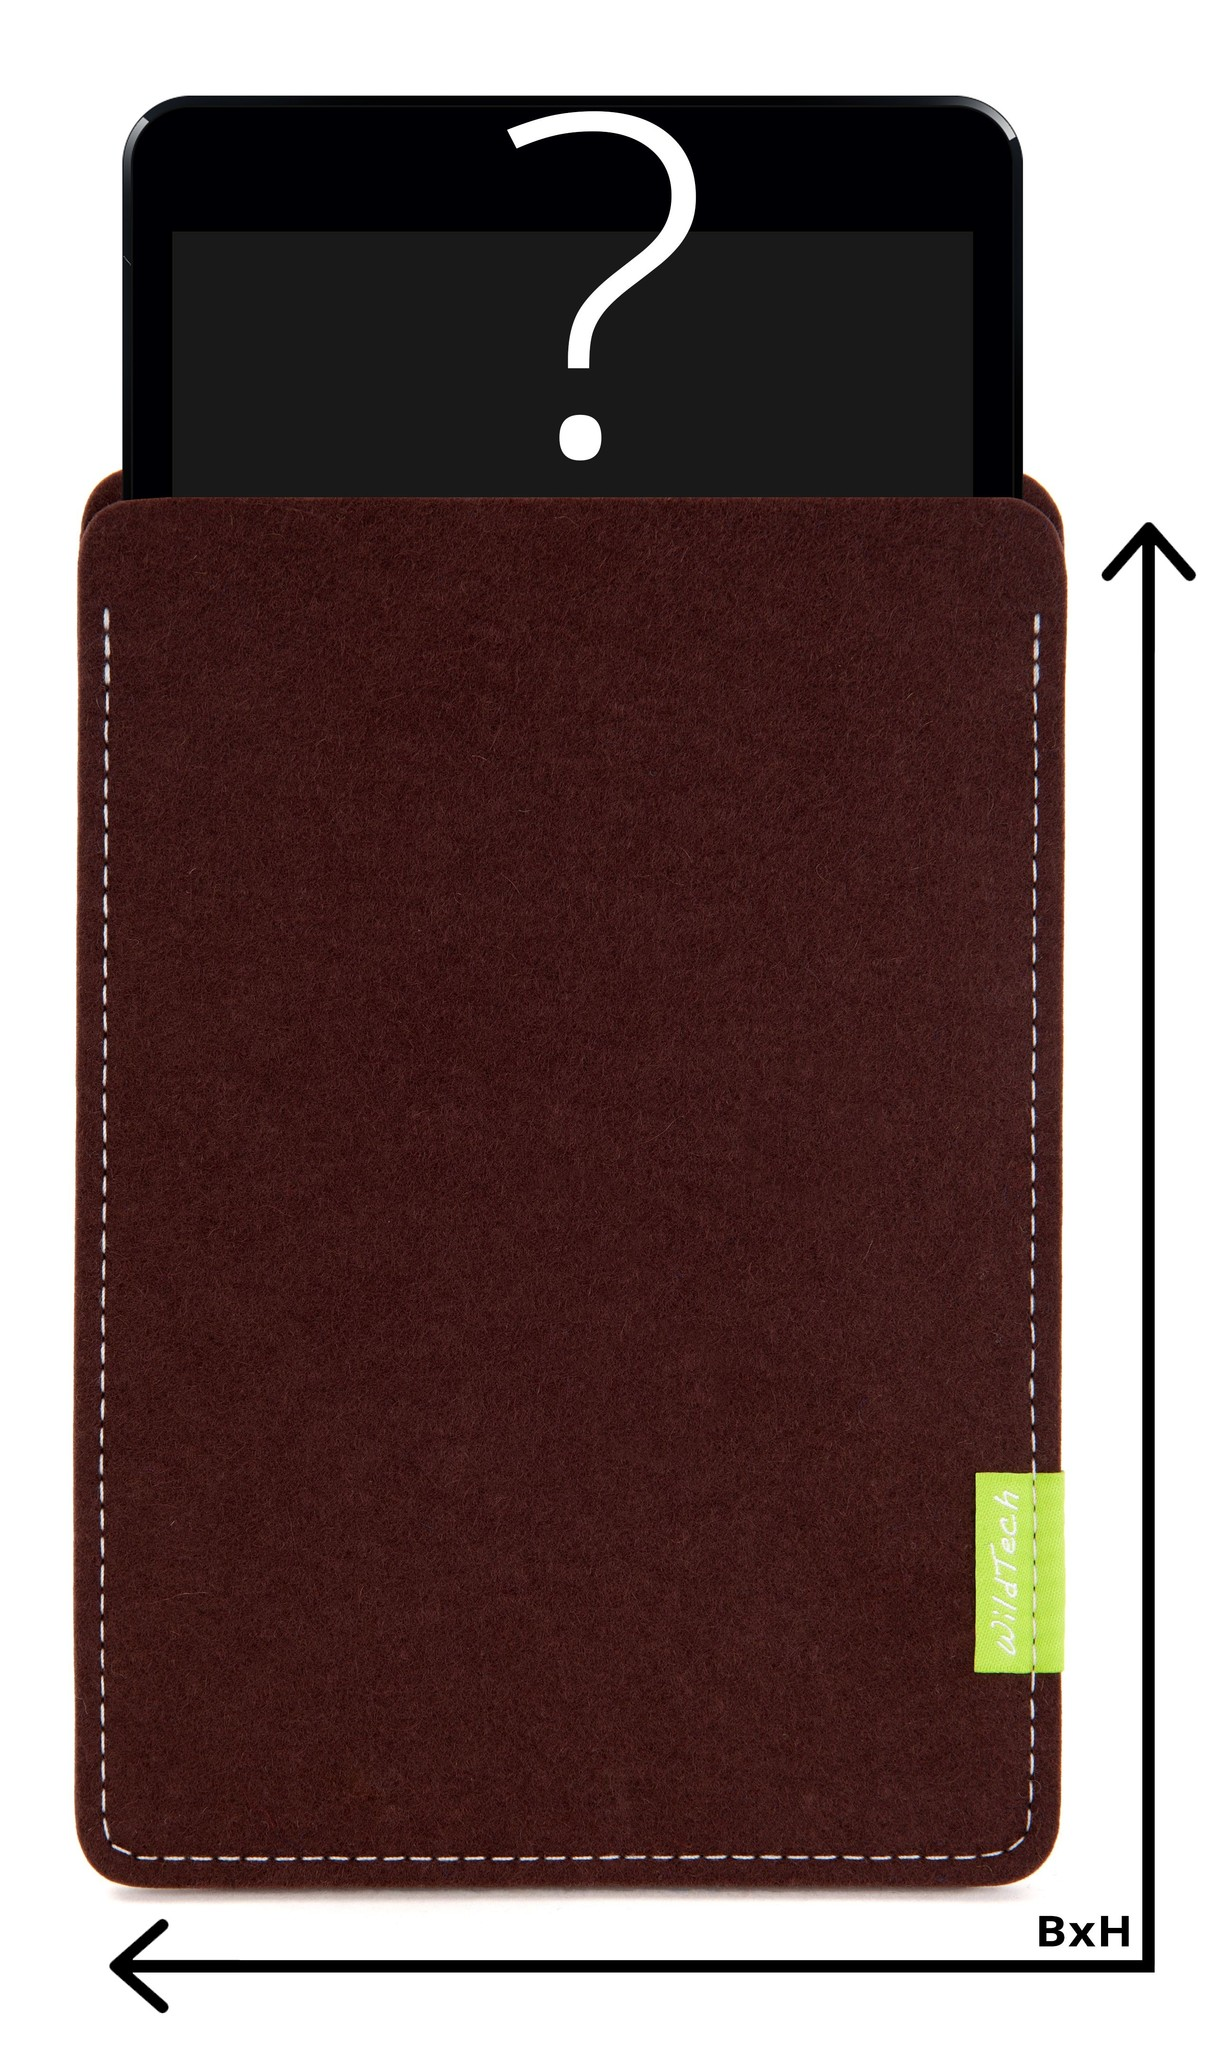 Individuelles Tablet Sleeve Dunkelbraun-1